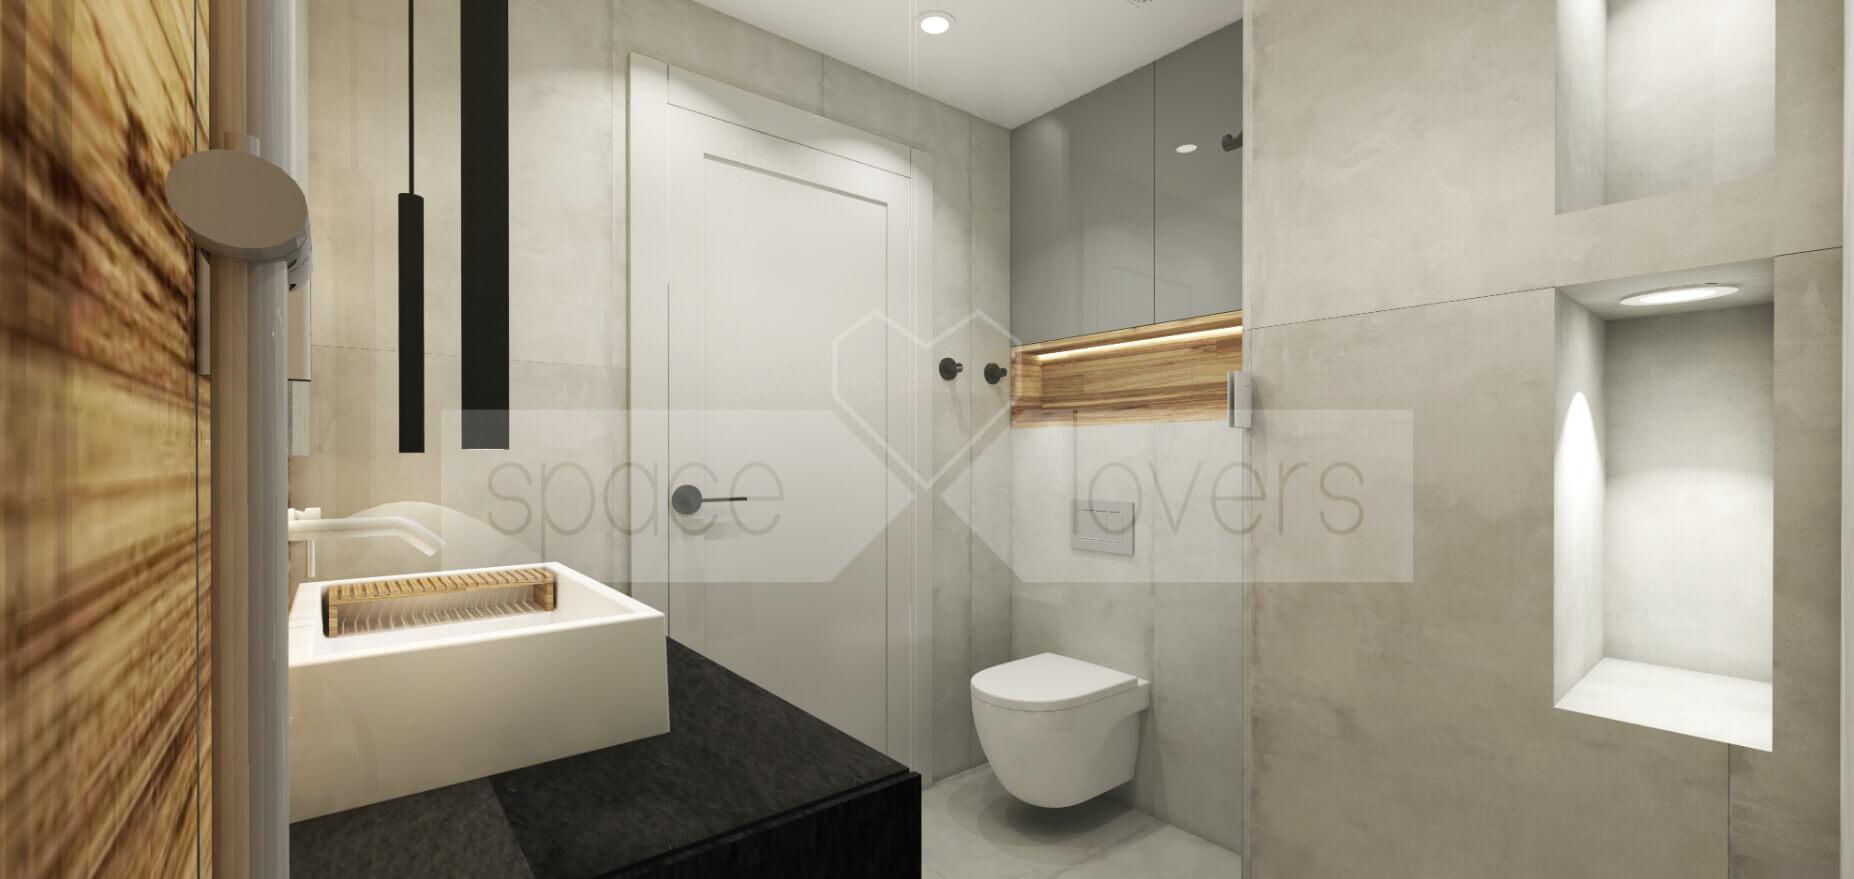 remodelacao-apartamento-parque-das-nacoes-lisboa-casa-banho-social-lavatorio-bancada-nicho